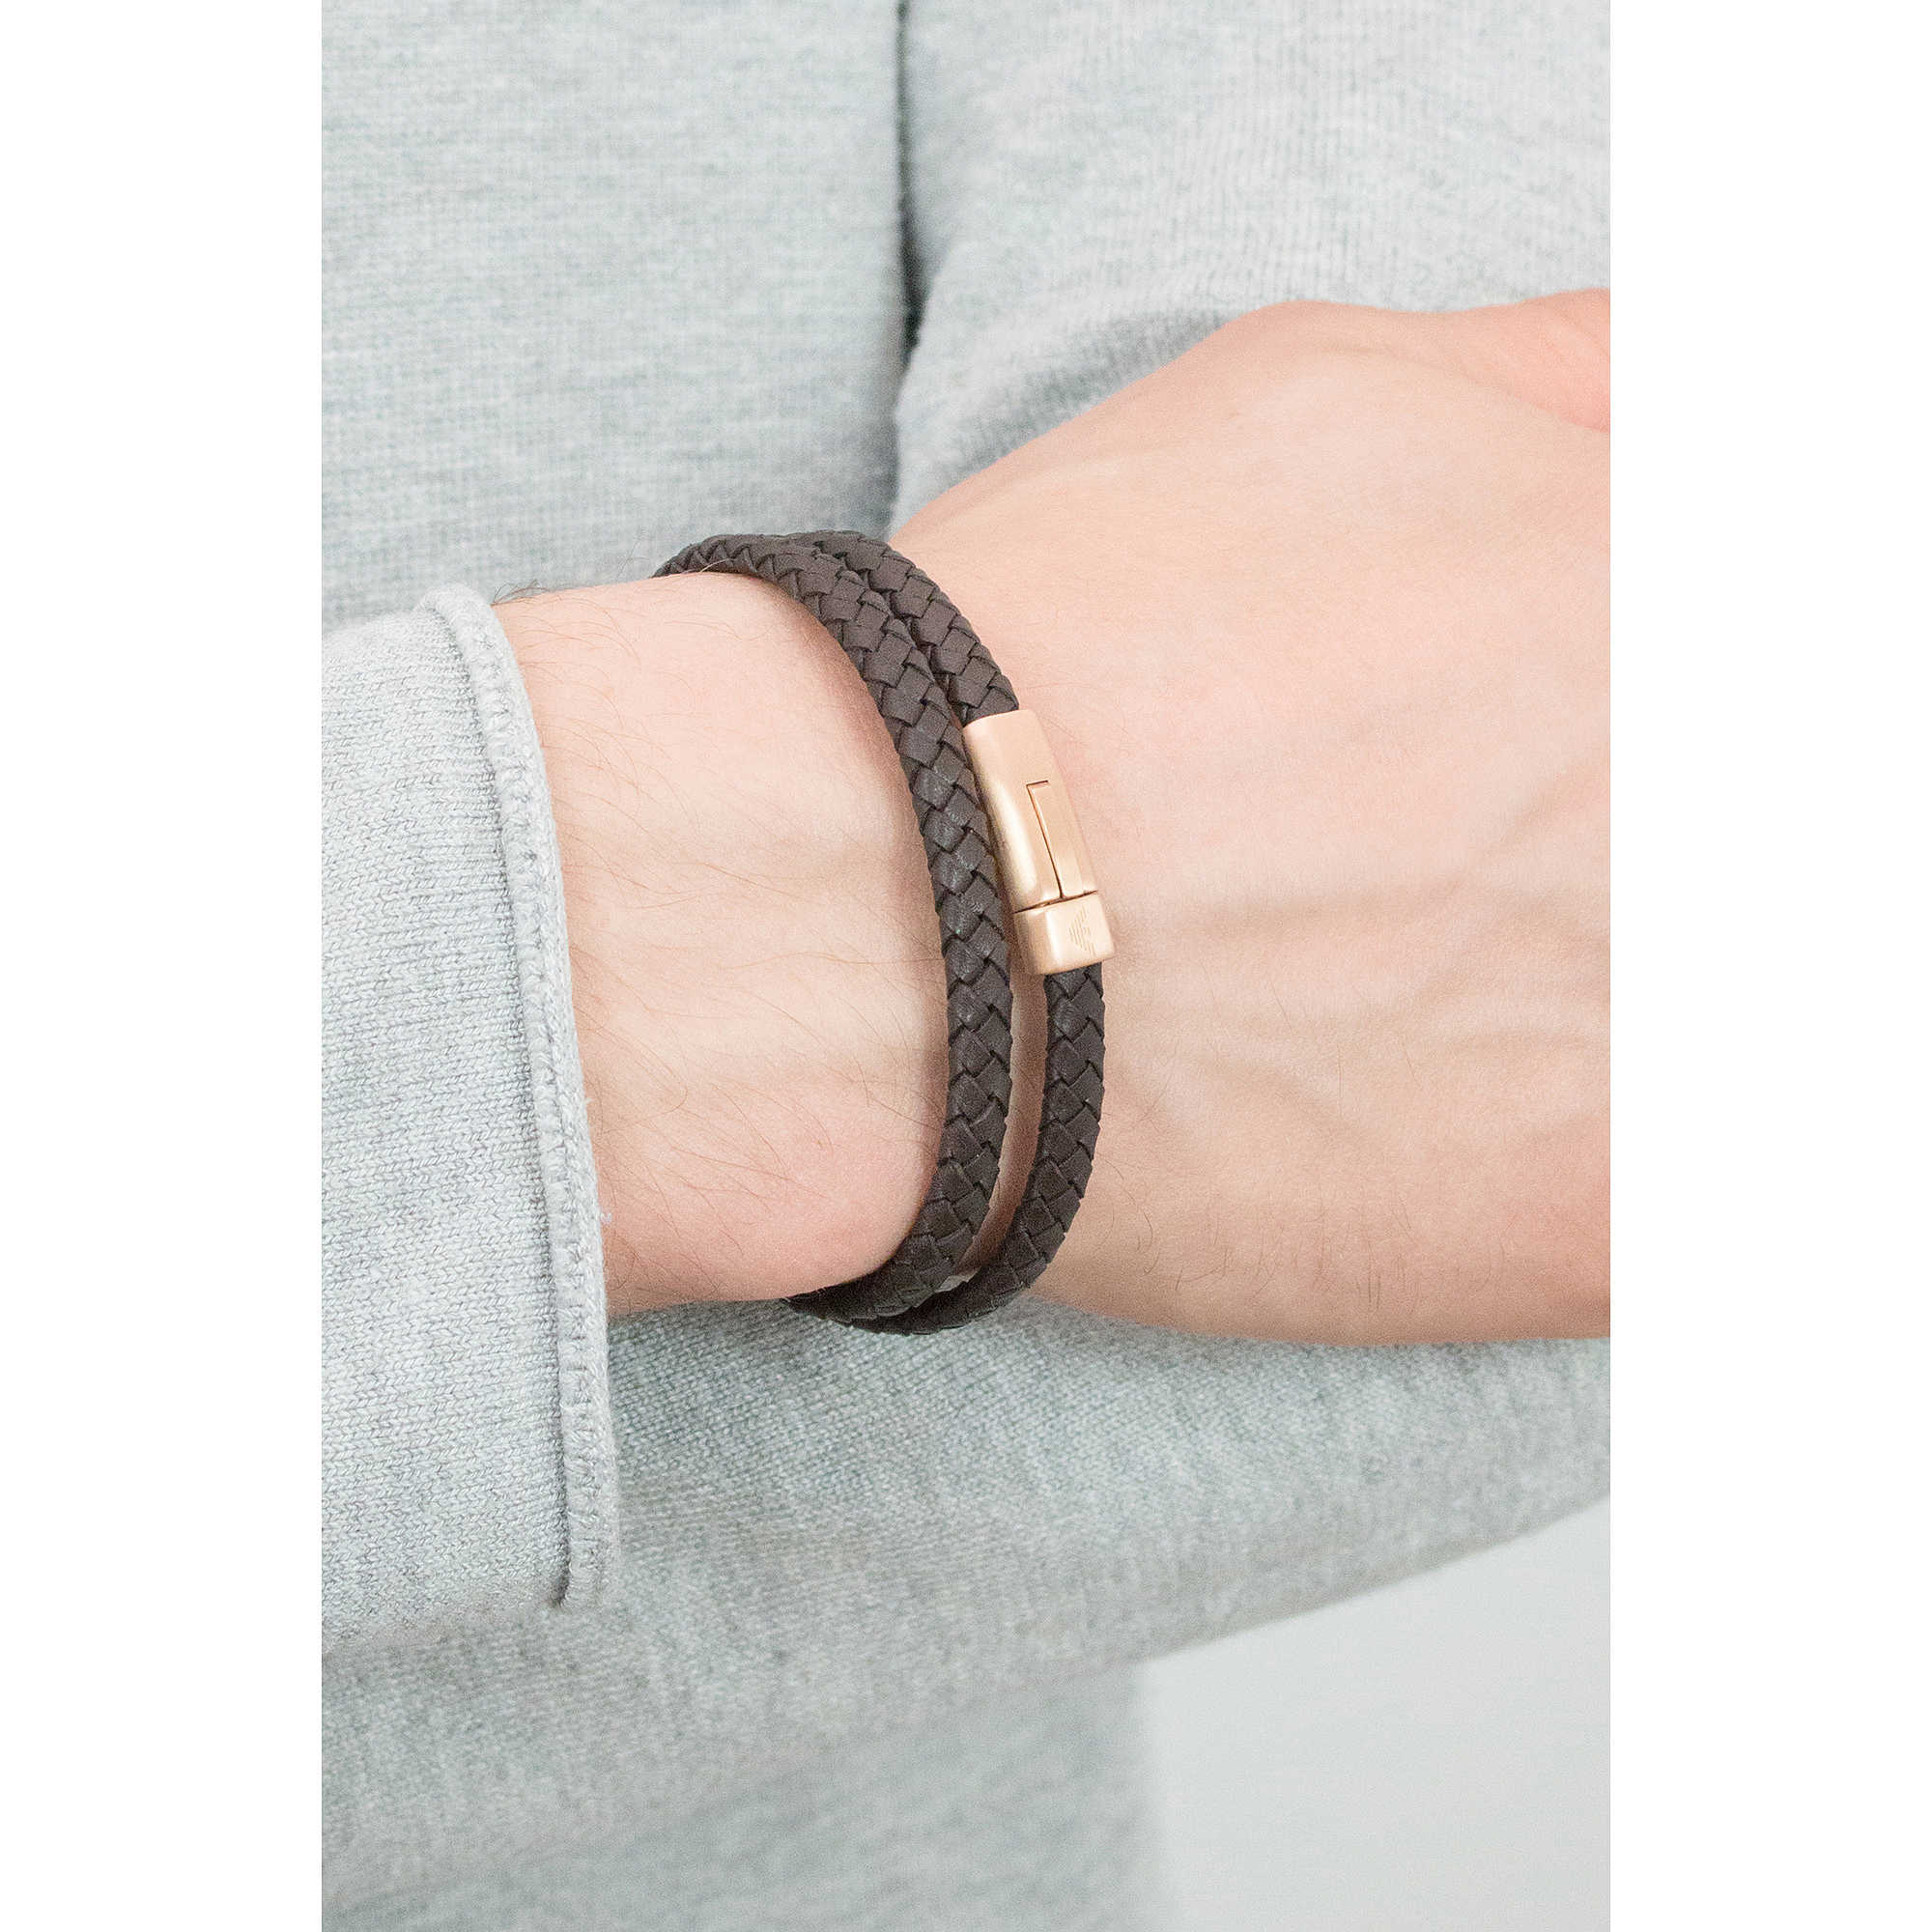 zoom. package bracelets Emporio Armani EGS2175221. zoom. bracelet man  jewellery Emporio Armani Signature EGS2175221 4f39b246126